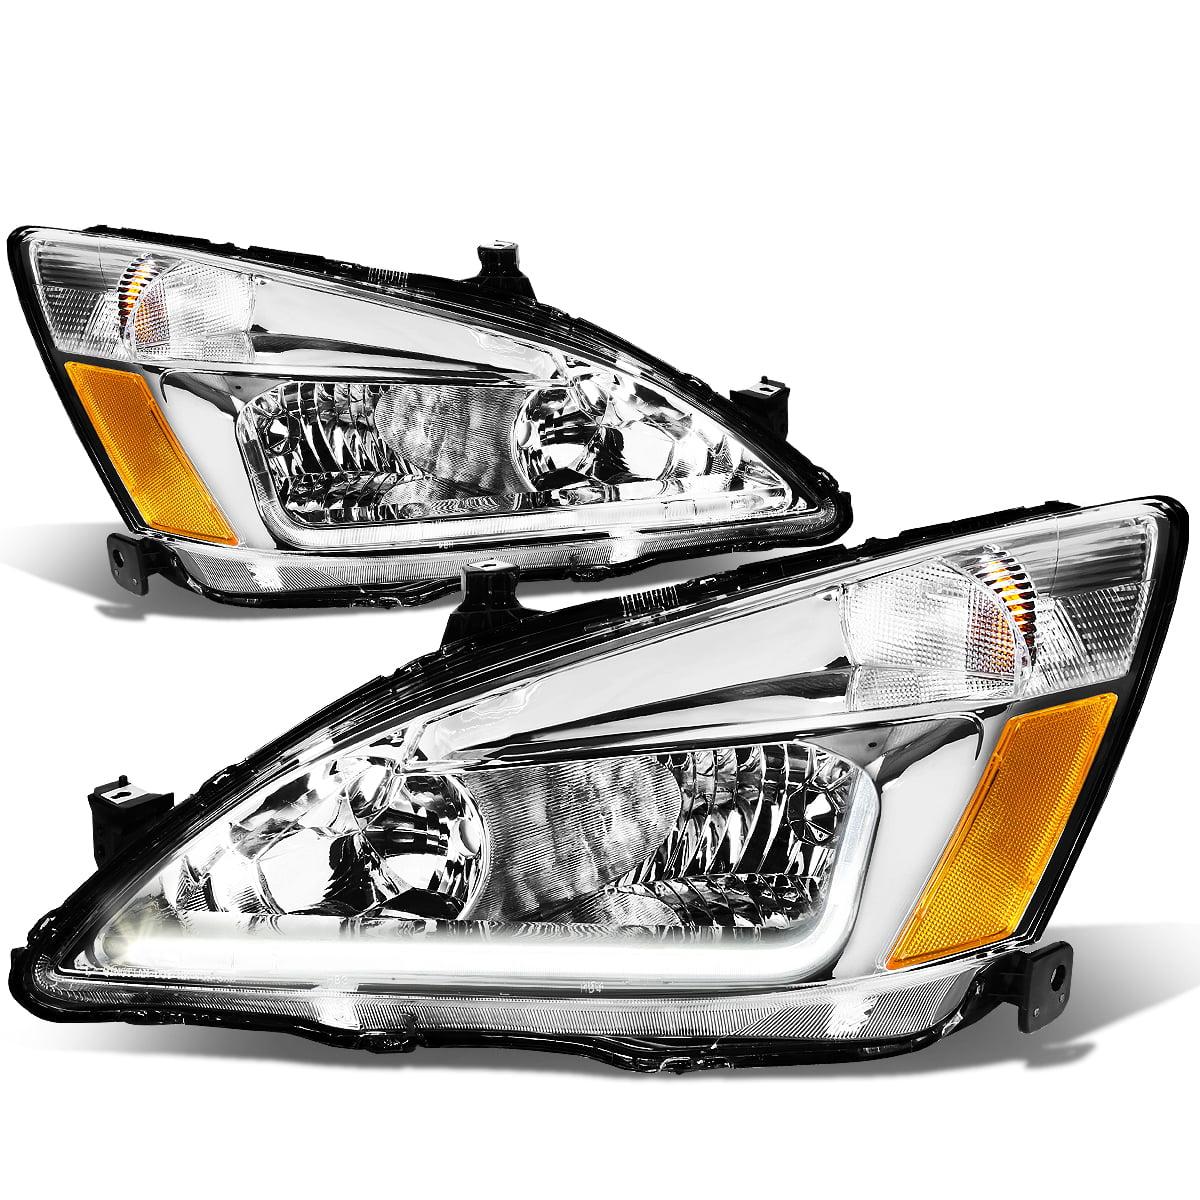 For 2003 To 2007 Honda Accord Led Drl Light Bar Headlight Chrome Housing Amber Corner Headlamp 04 05 06 Left Right Walmart Com Walmart Com